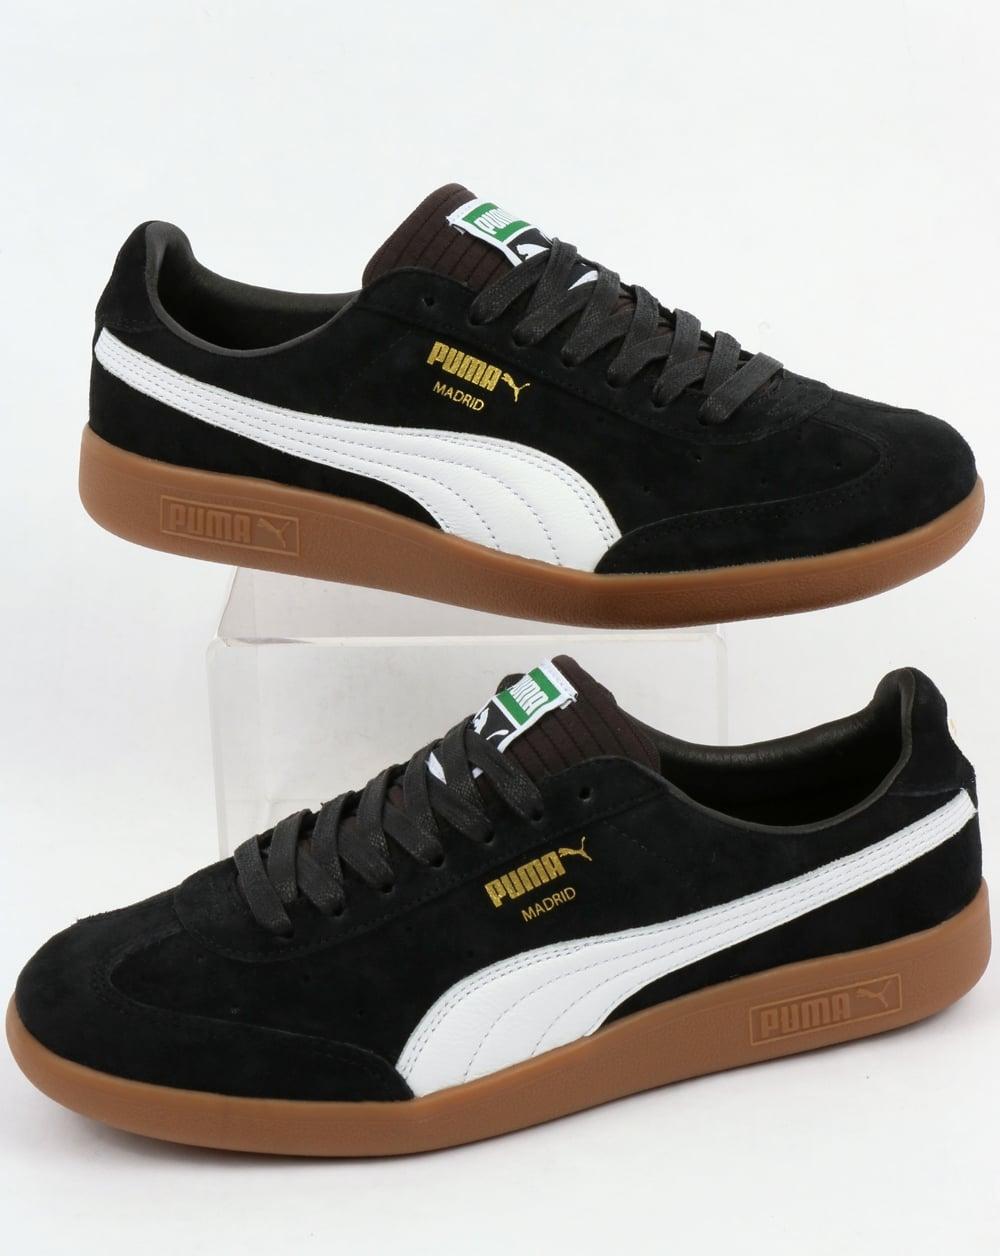 premium selection ed388 b279e Puma Madrid Lux Trainers Black/White